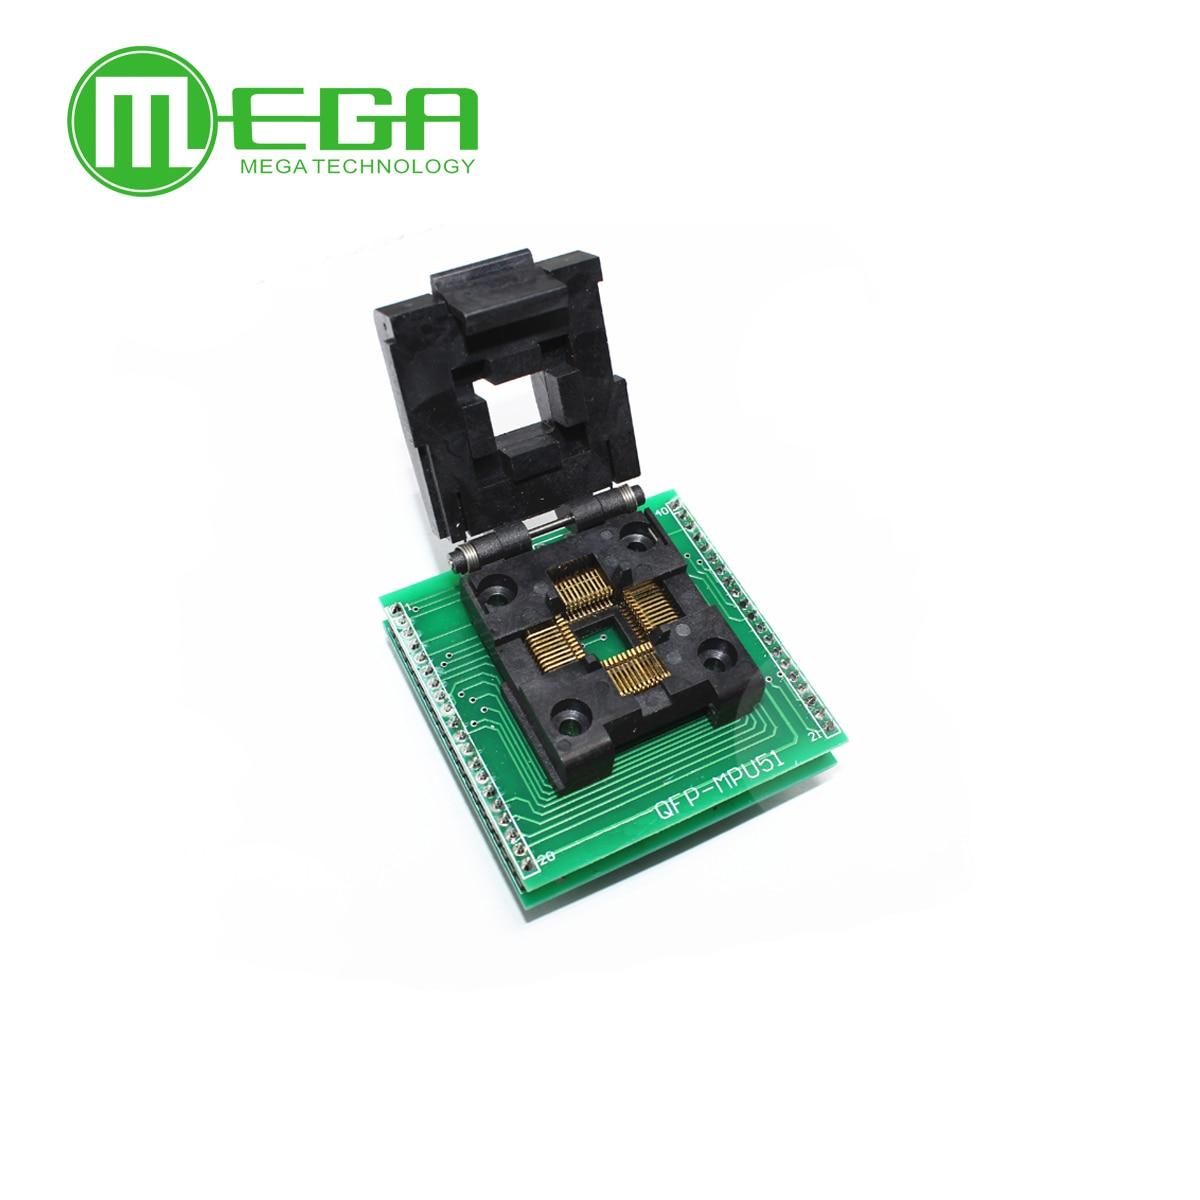 CHIP PROGRAMMER SOCKET TQFP44 QFP44/ PQFP44 TO DIP40 adapter socket support MPU-51 chipCHIP PROGRAMMER SOCKET TQFP44 QFP44/ PQFP44 TO DIP40 adapter socket support MPU-51 chip